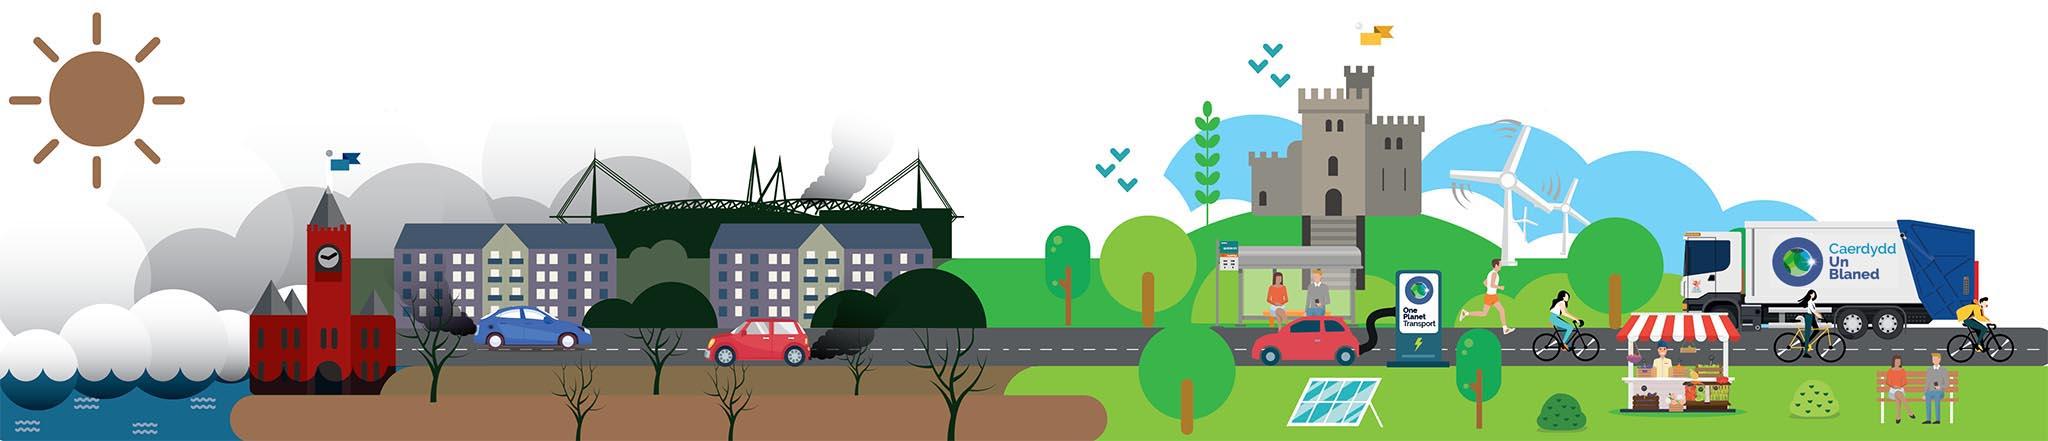 Polluted skies vs green environment